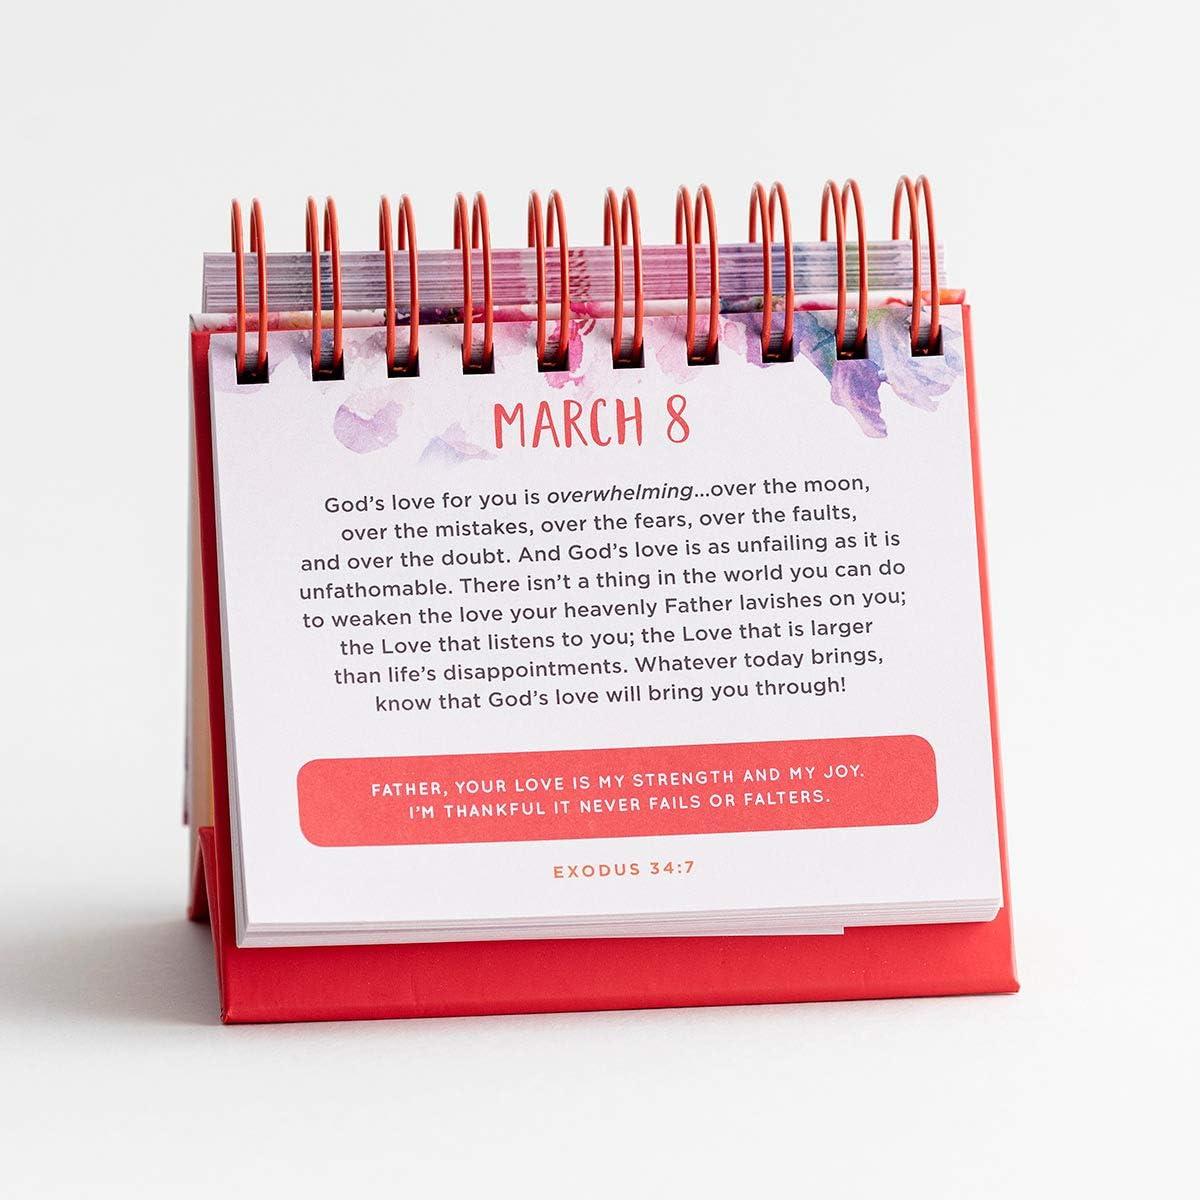 J1393 Pink DaySpring 5 1//2 x 5 1//4 x 1 1//4 Perpetual Calendar It is Well